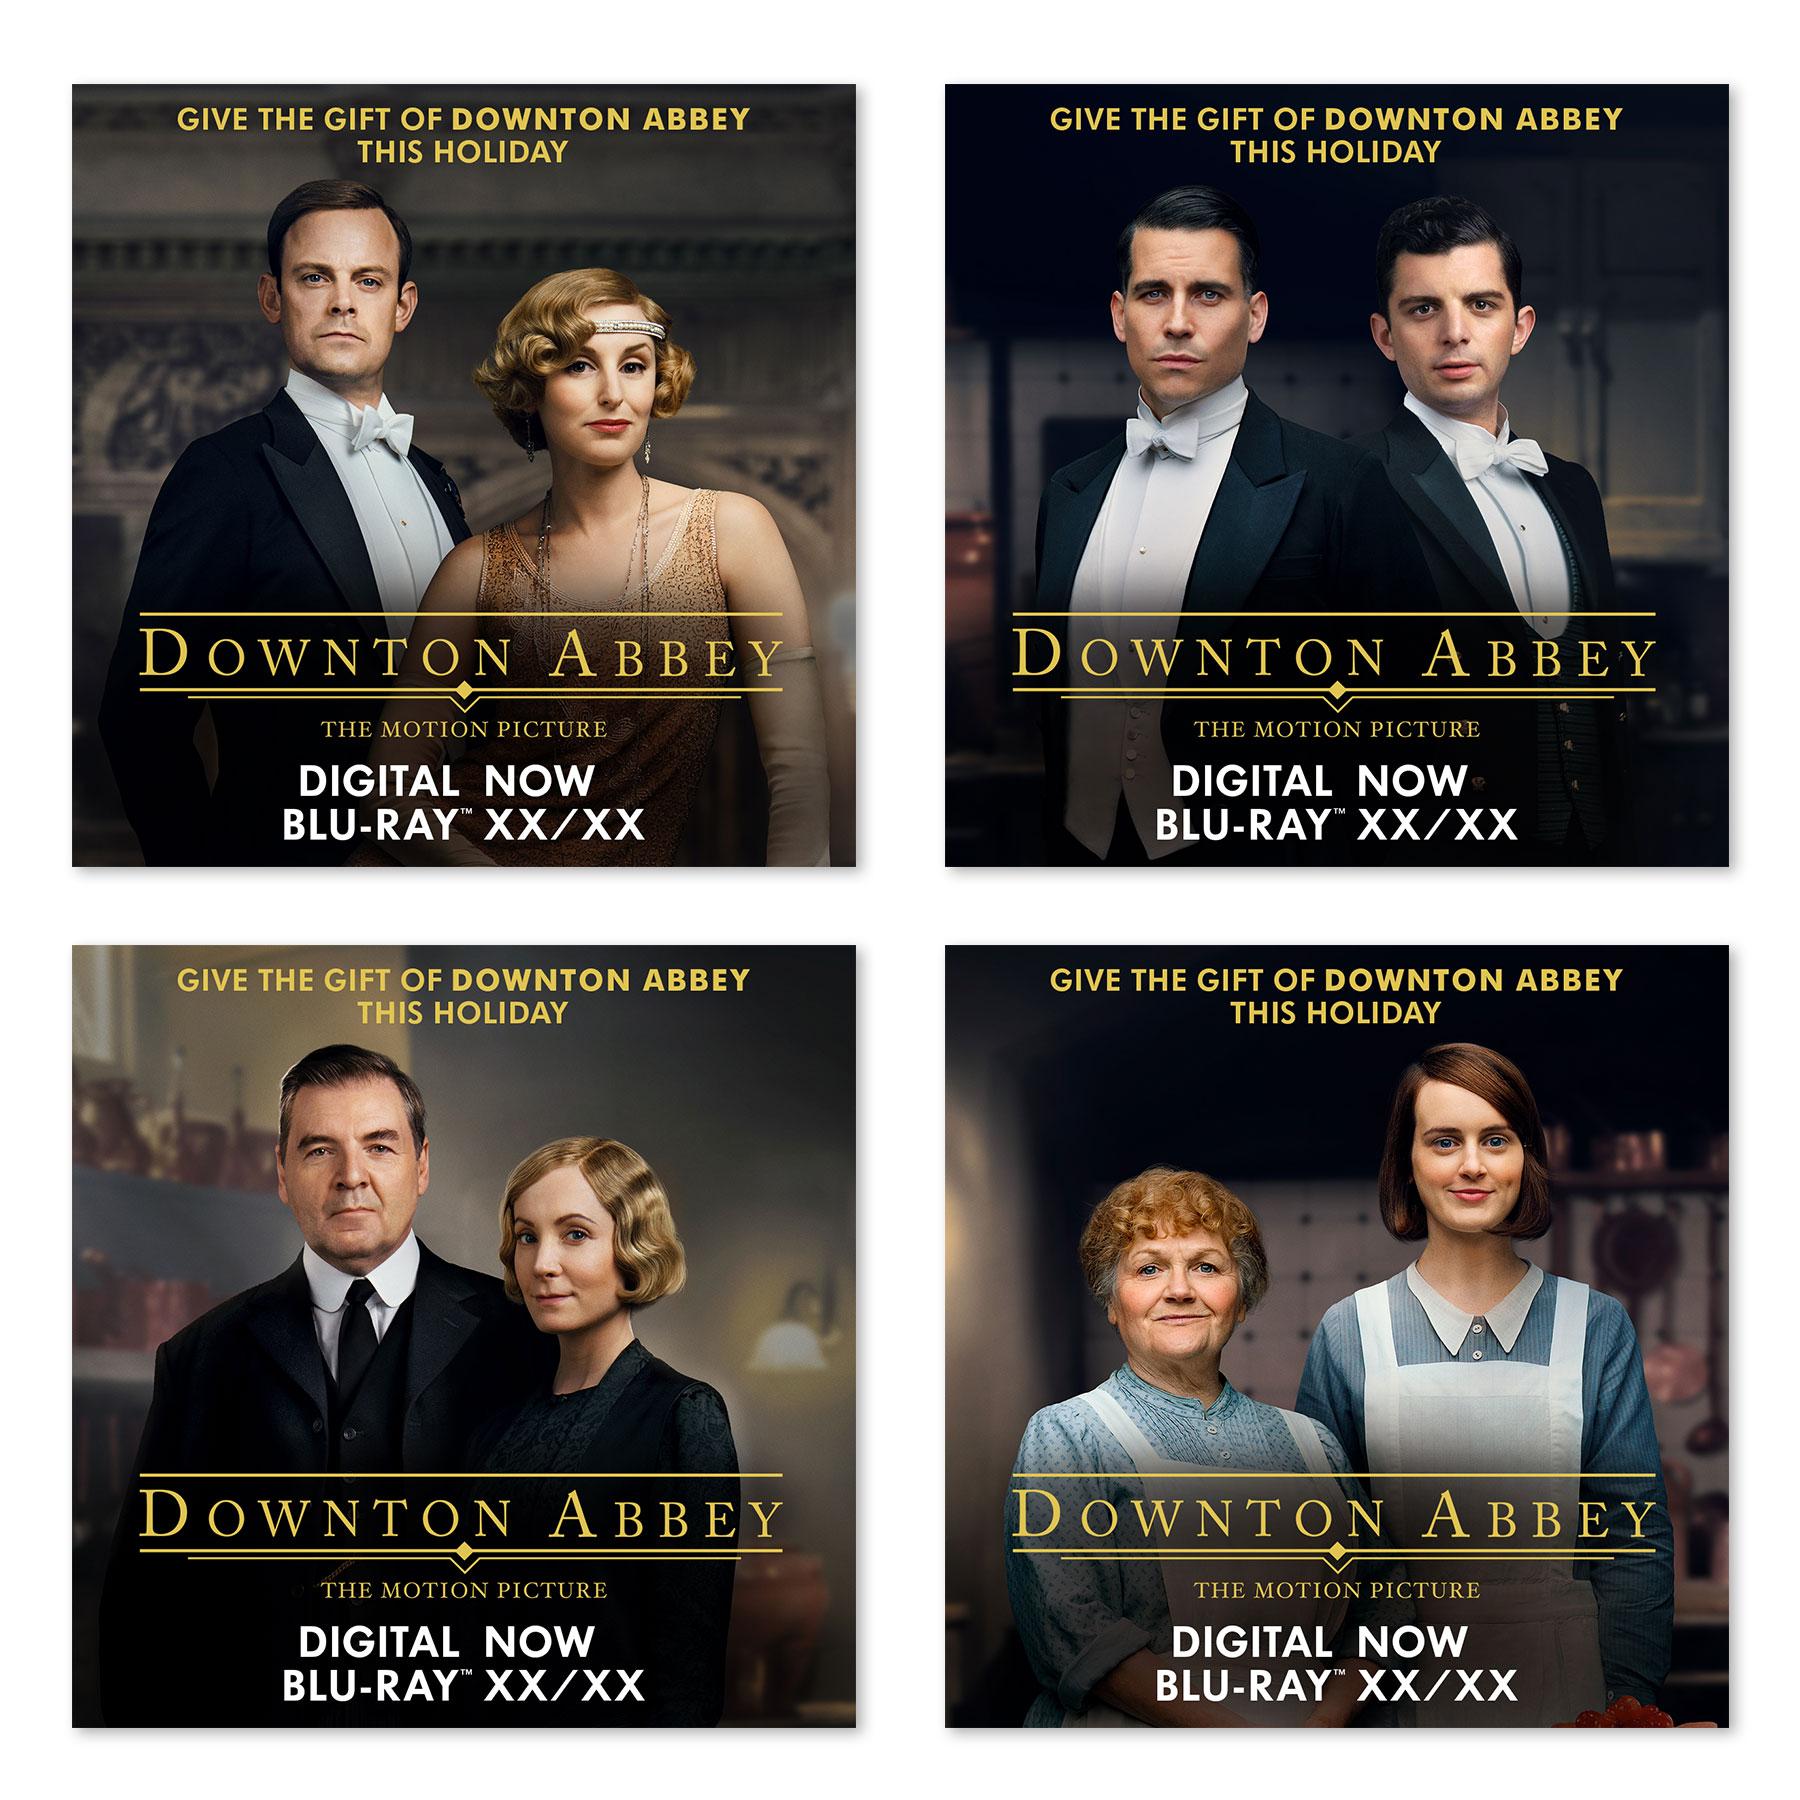 Downton Abbey International Banners